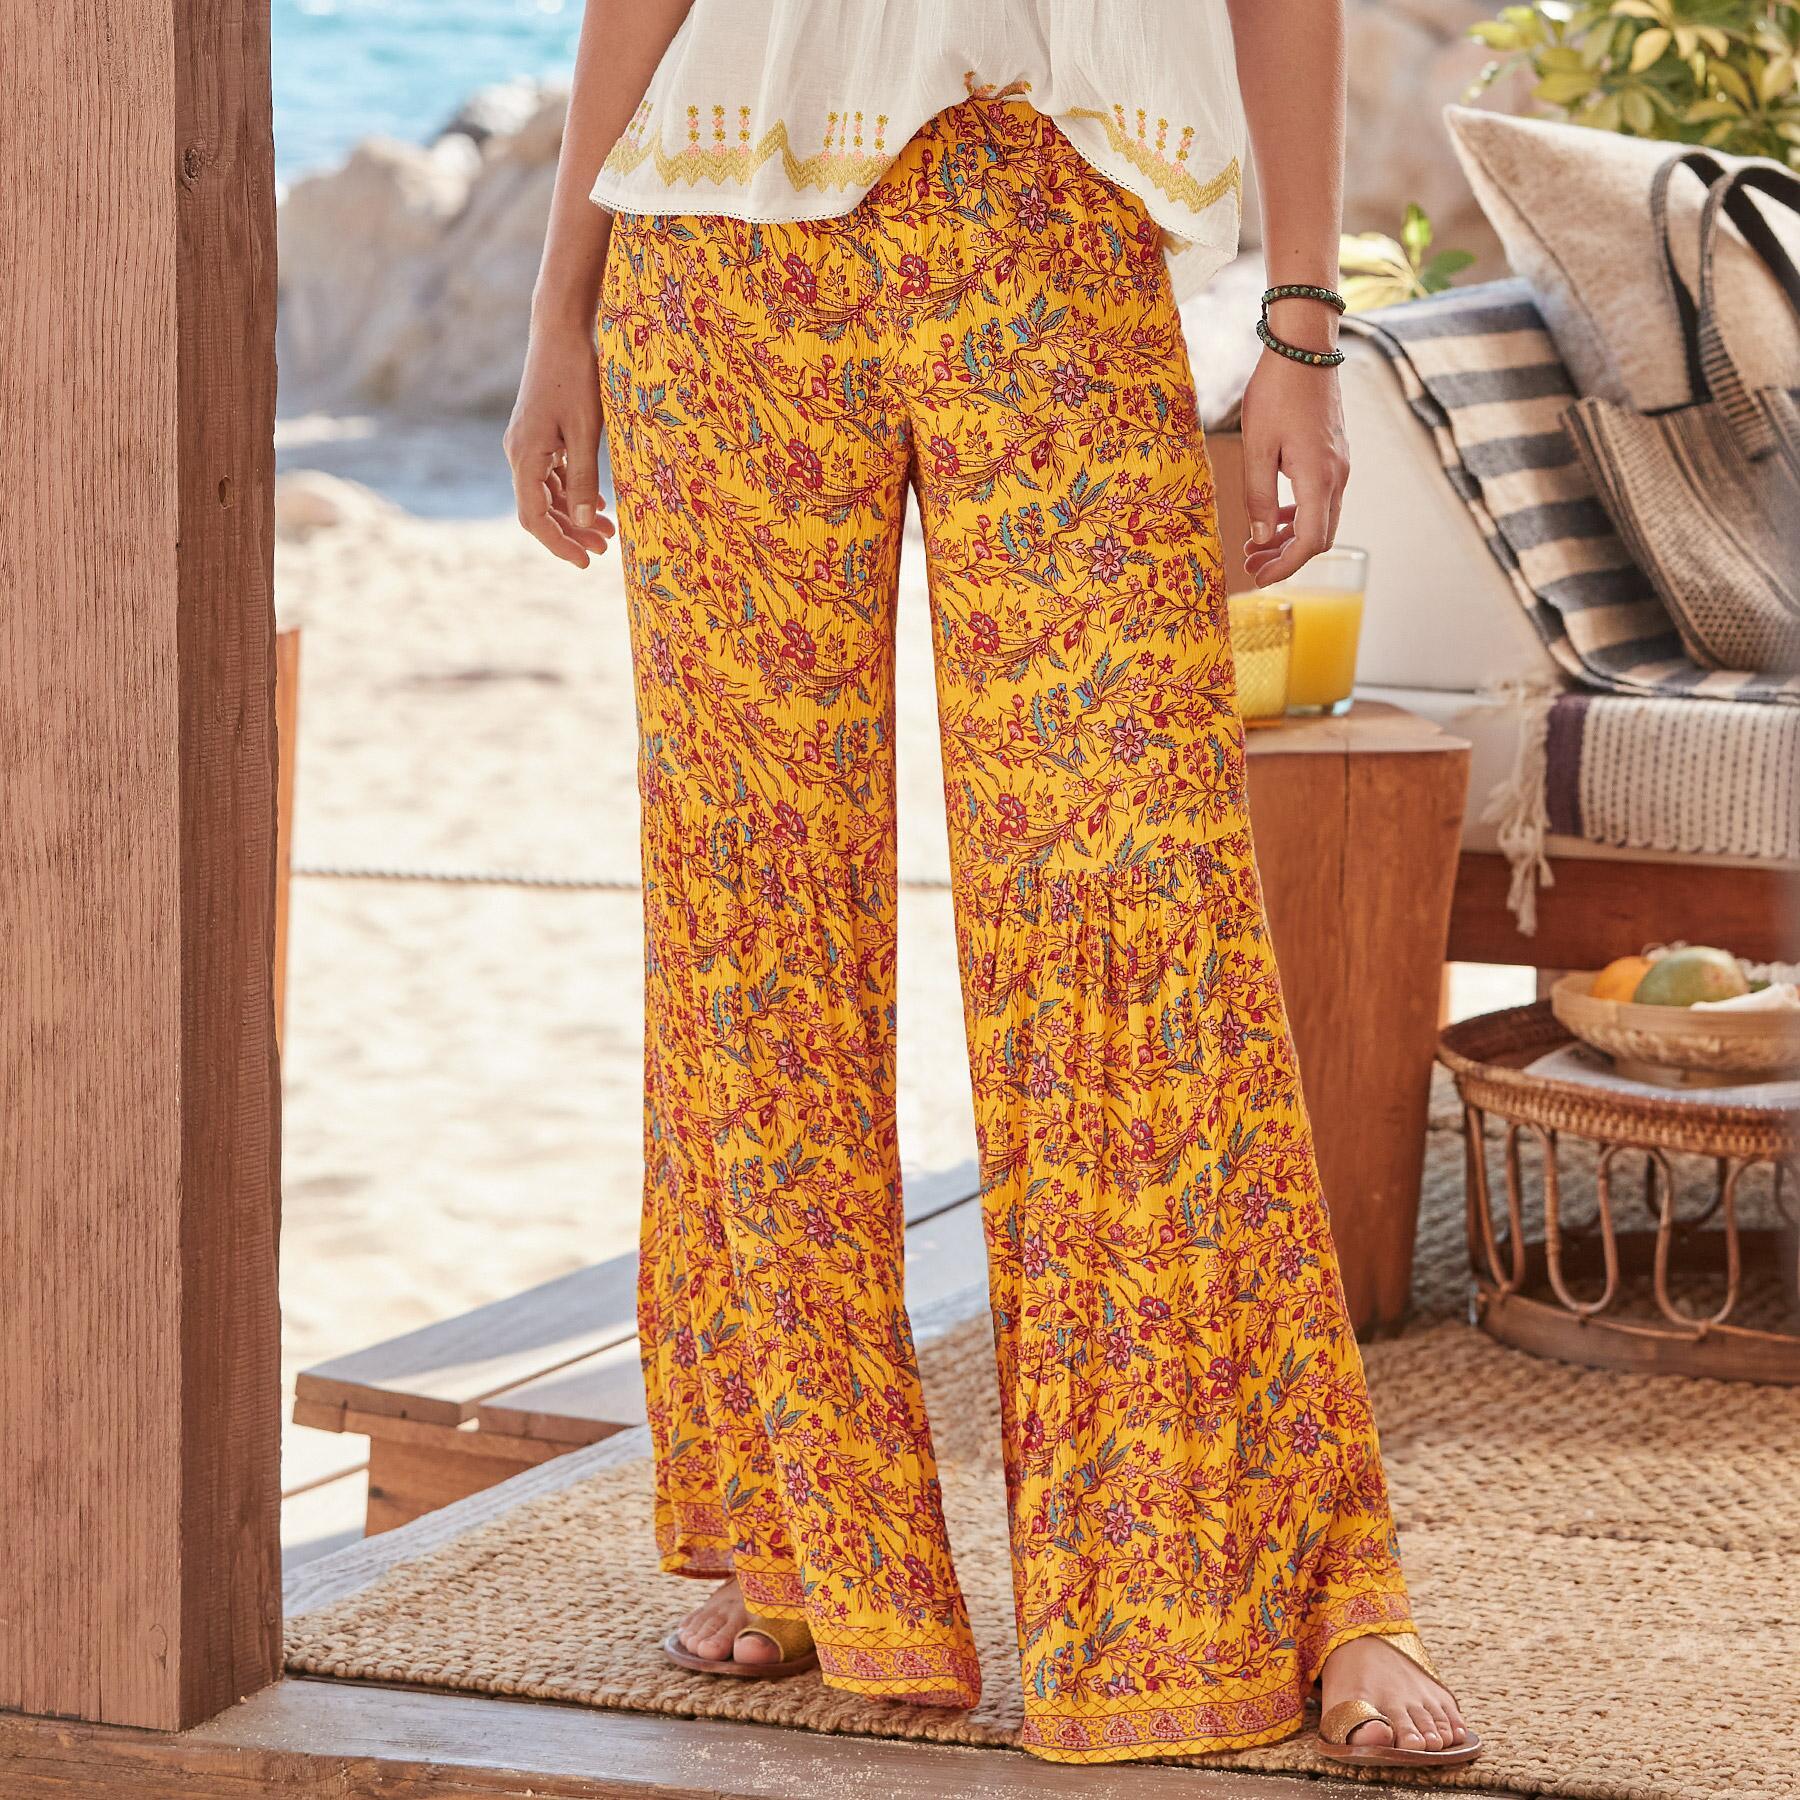 BEACHSIDE DAYDREAM PANTS: View 1